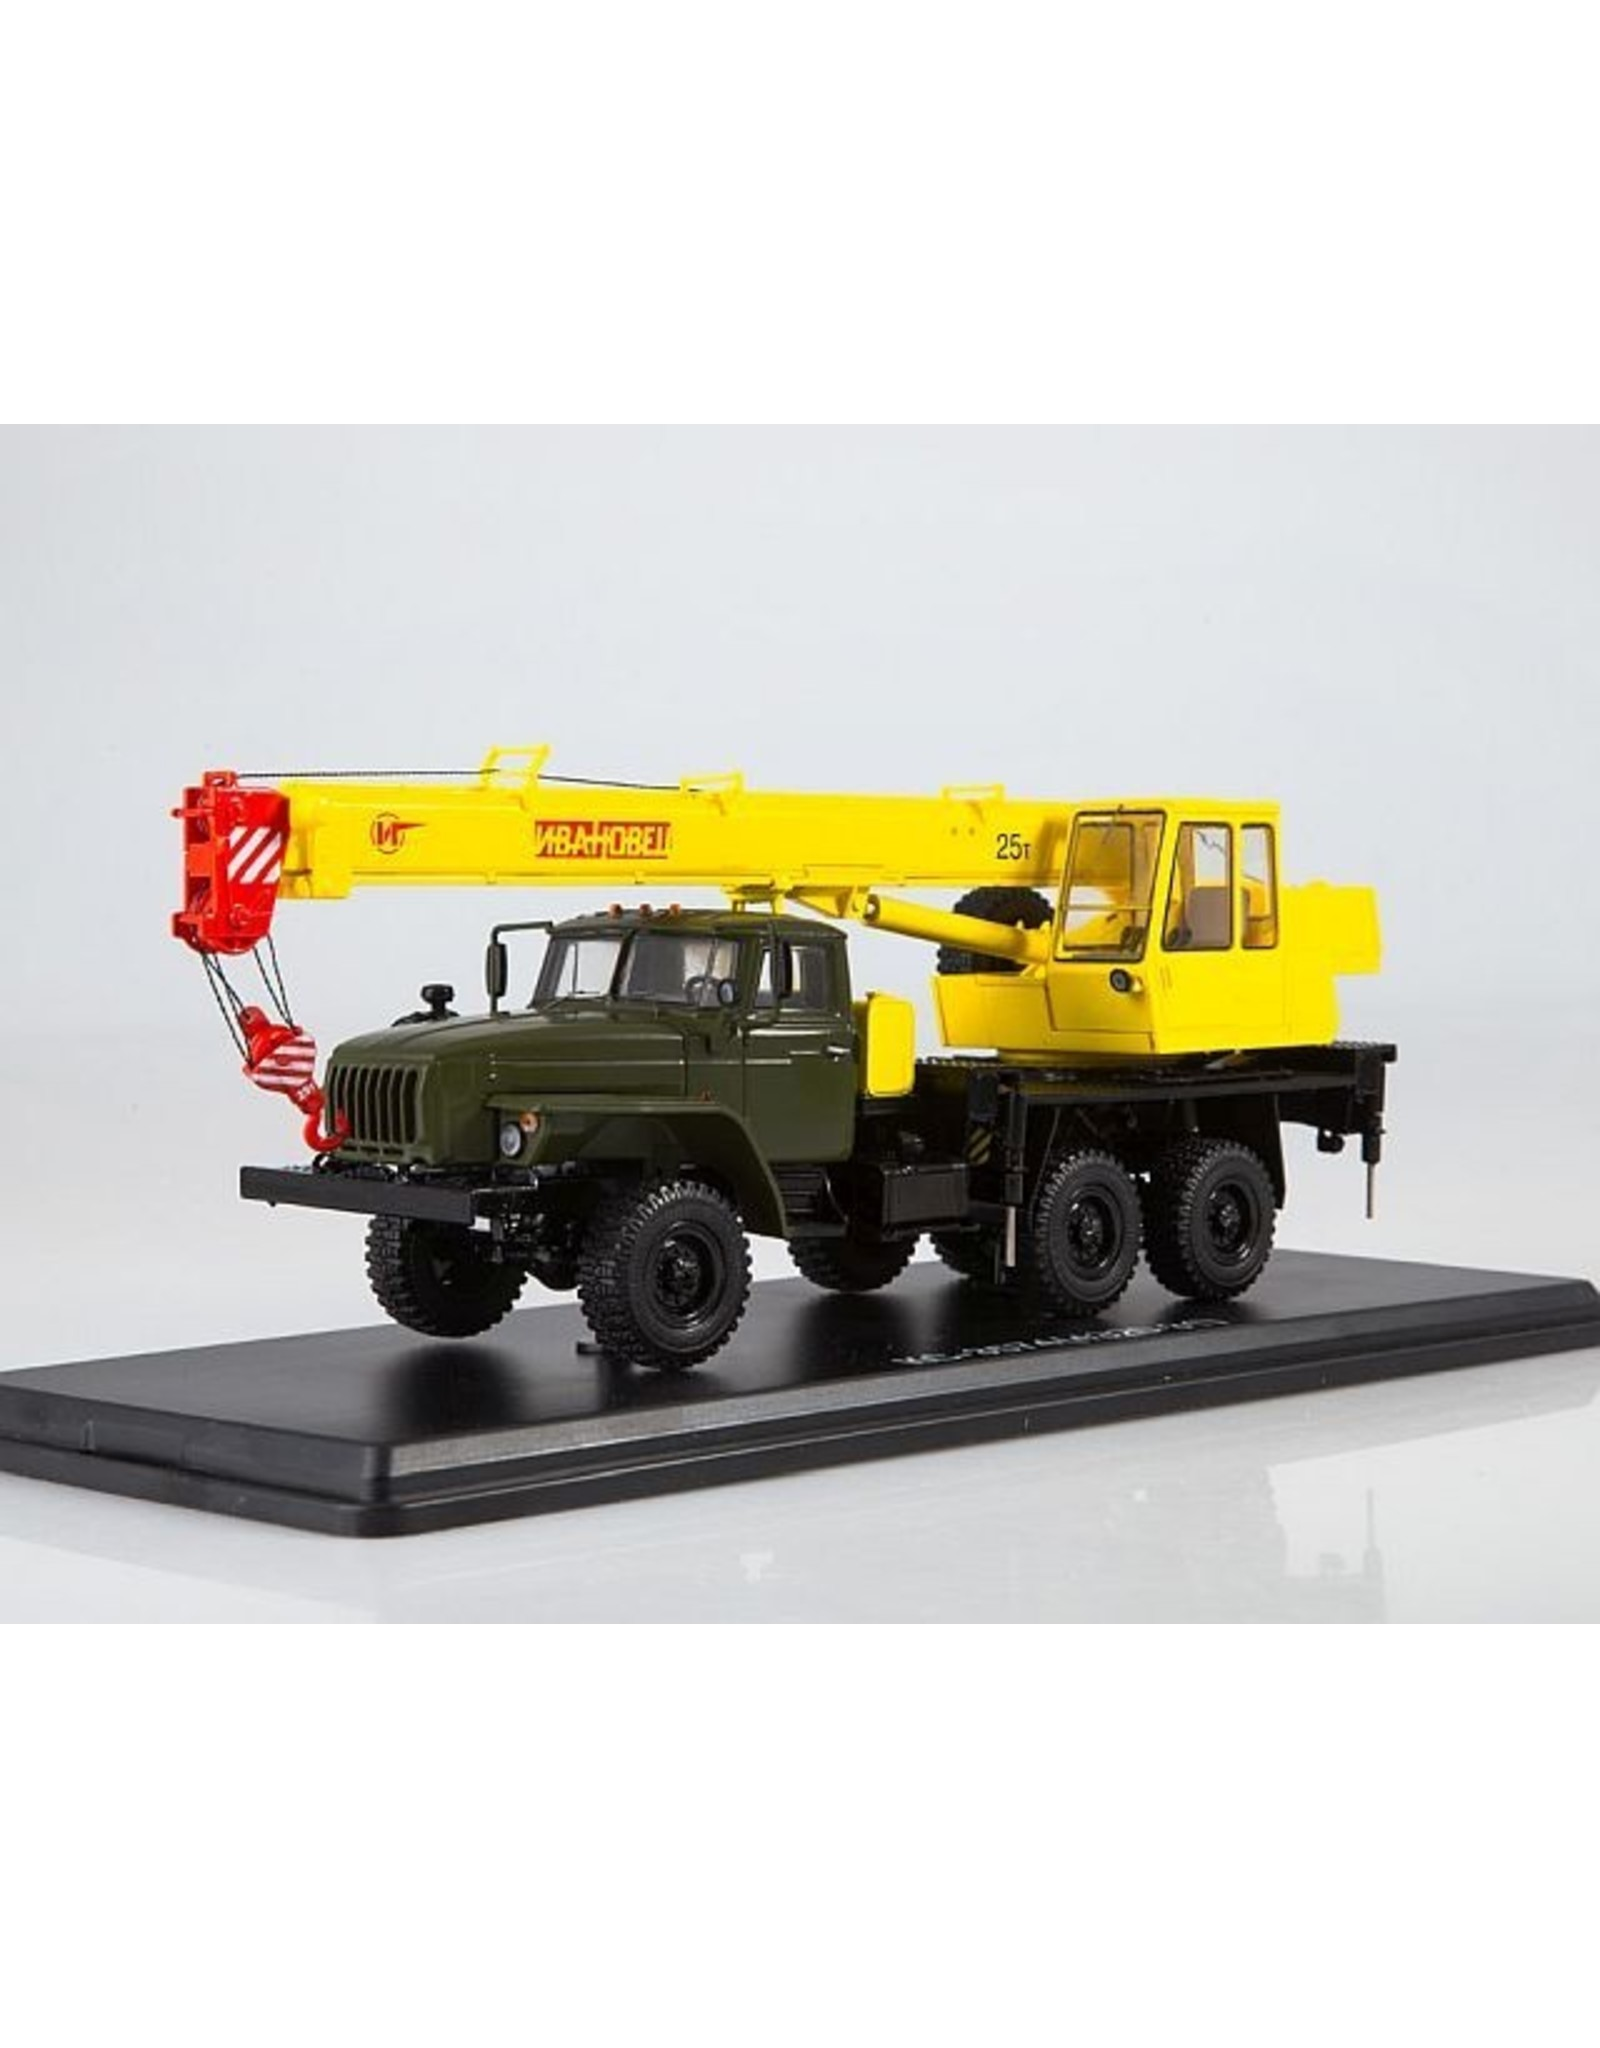 URAL AUTOMOTIVE PLANT CRANE TRUCK KS-3574(URAL-4320-31)olive/yellow